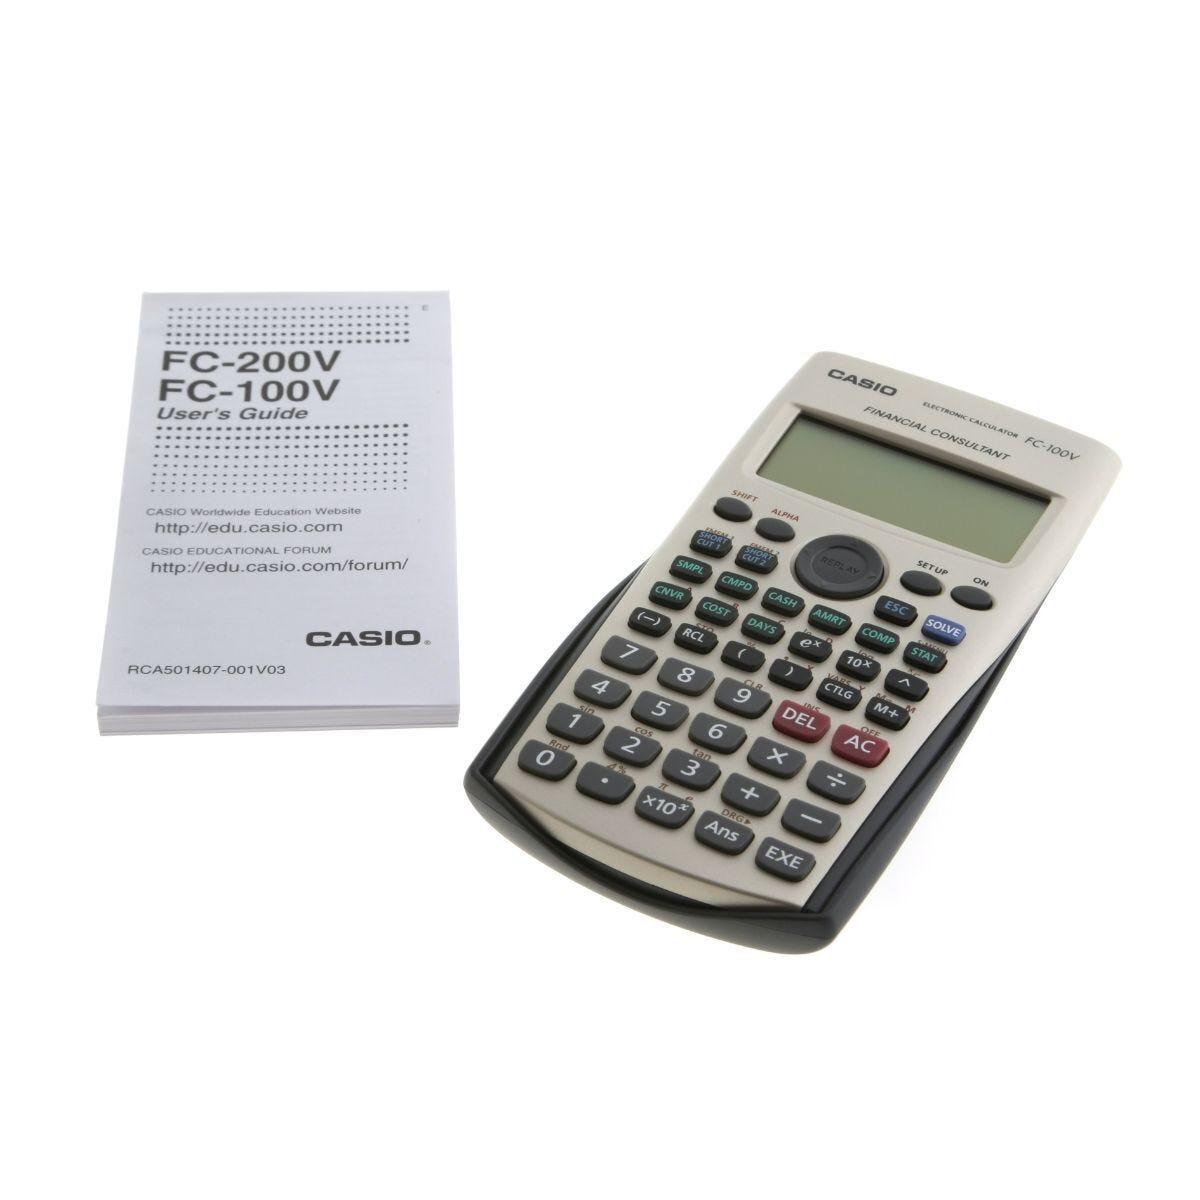 Casio FC-100V Financial Handheld Calculator